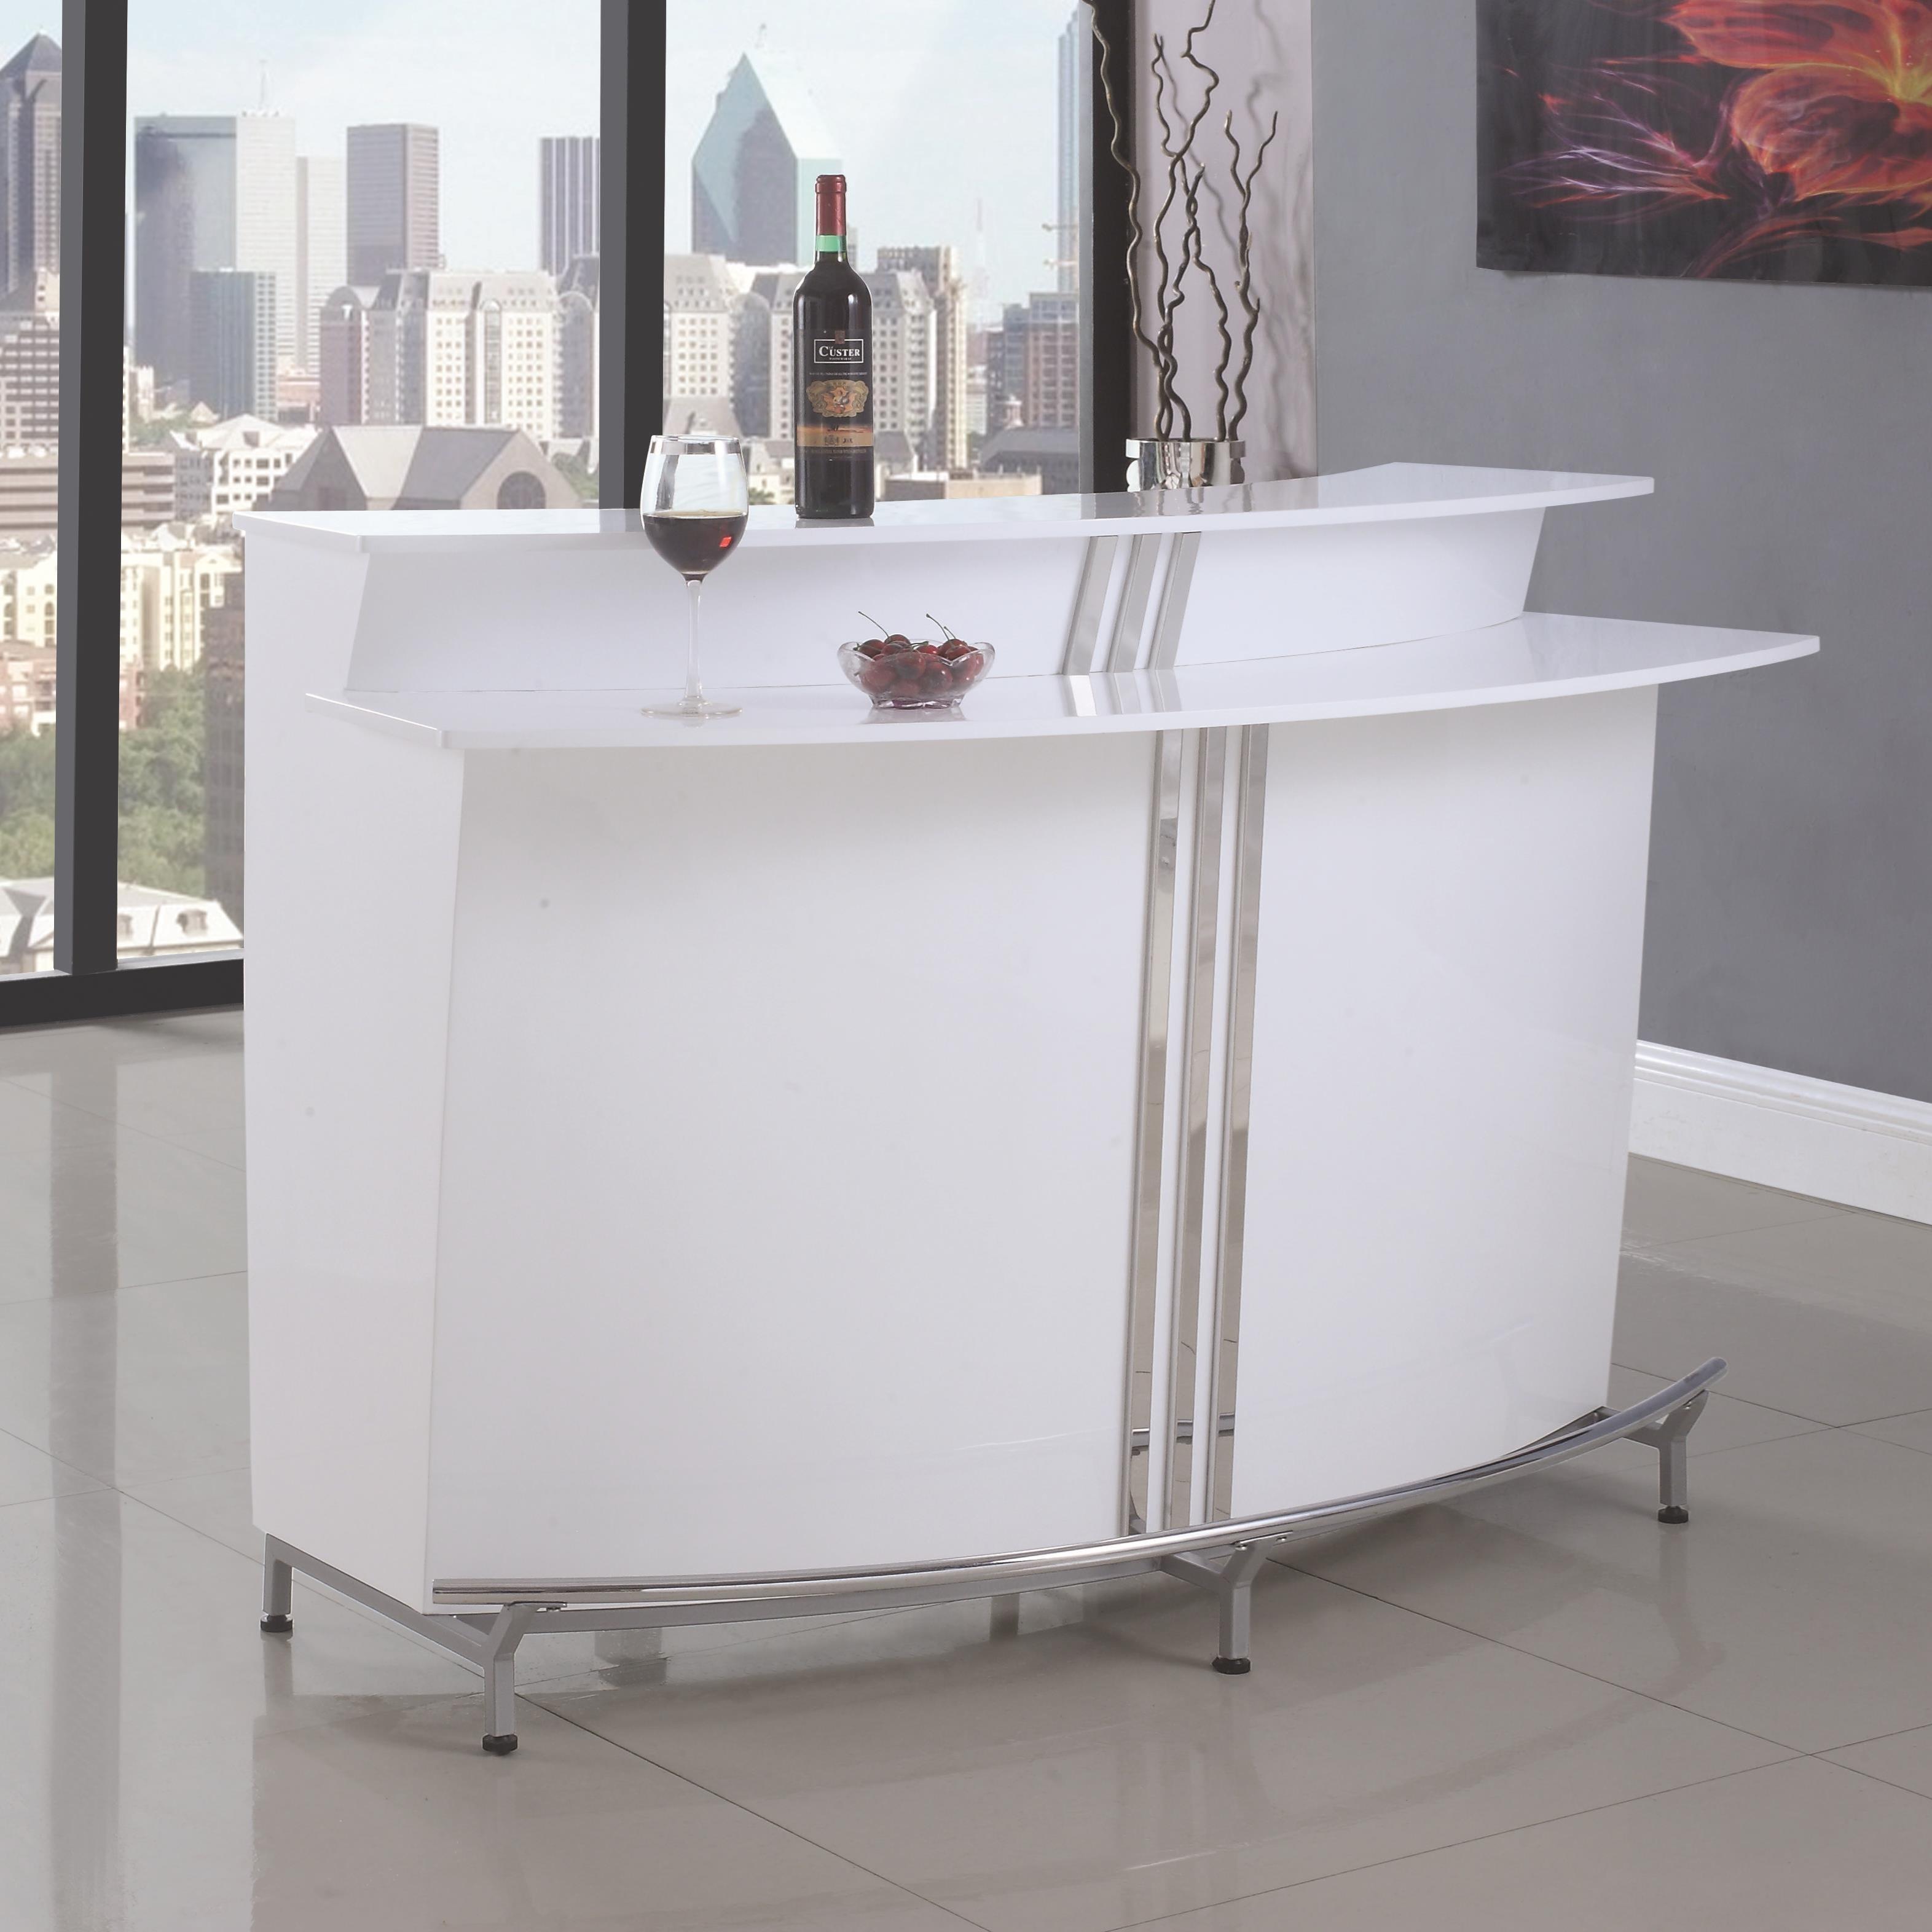 Bar Units and Bar Tables Bar Unit by Coaster at Standard Furniture